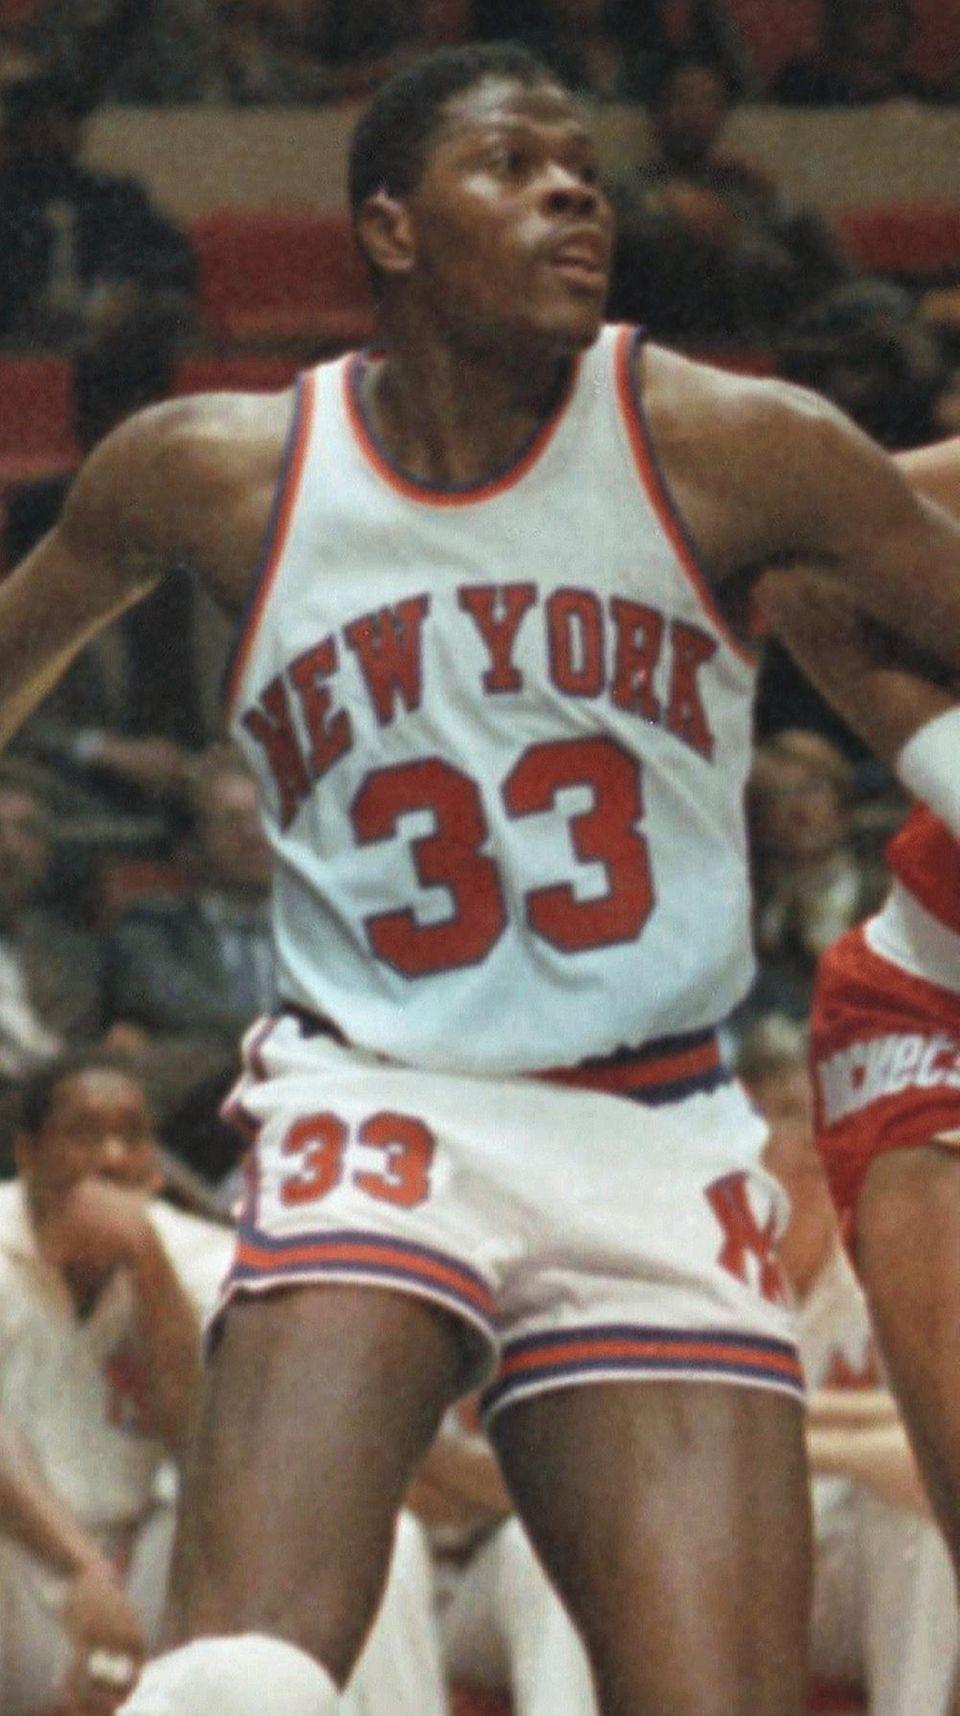 1983-87 home jerseys